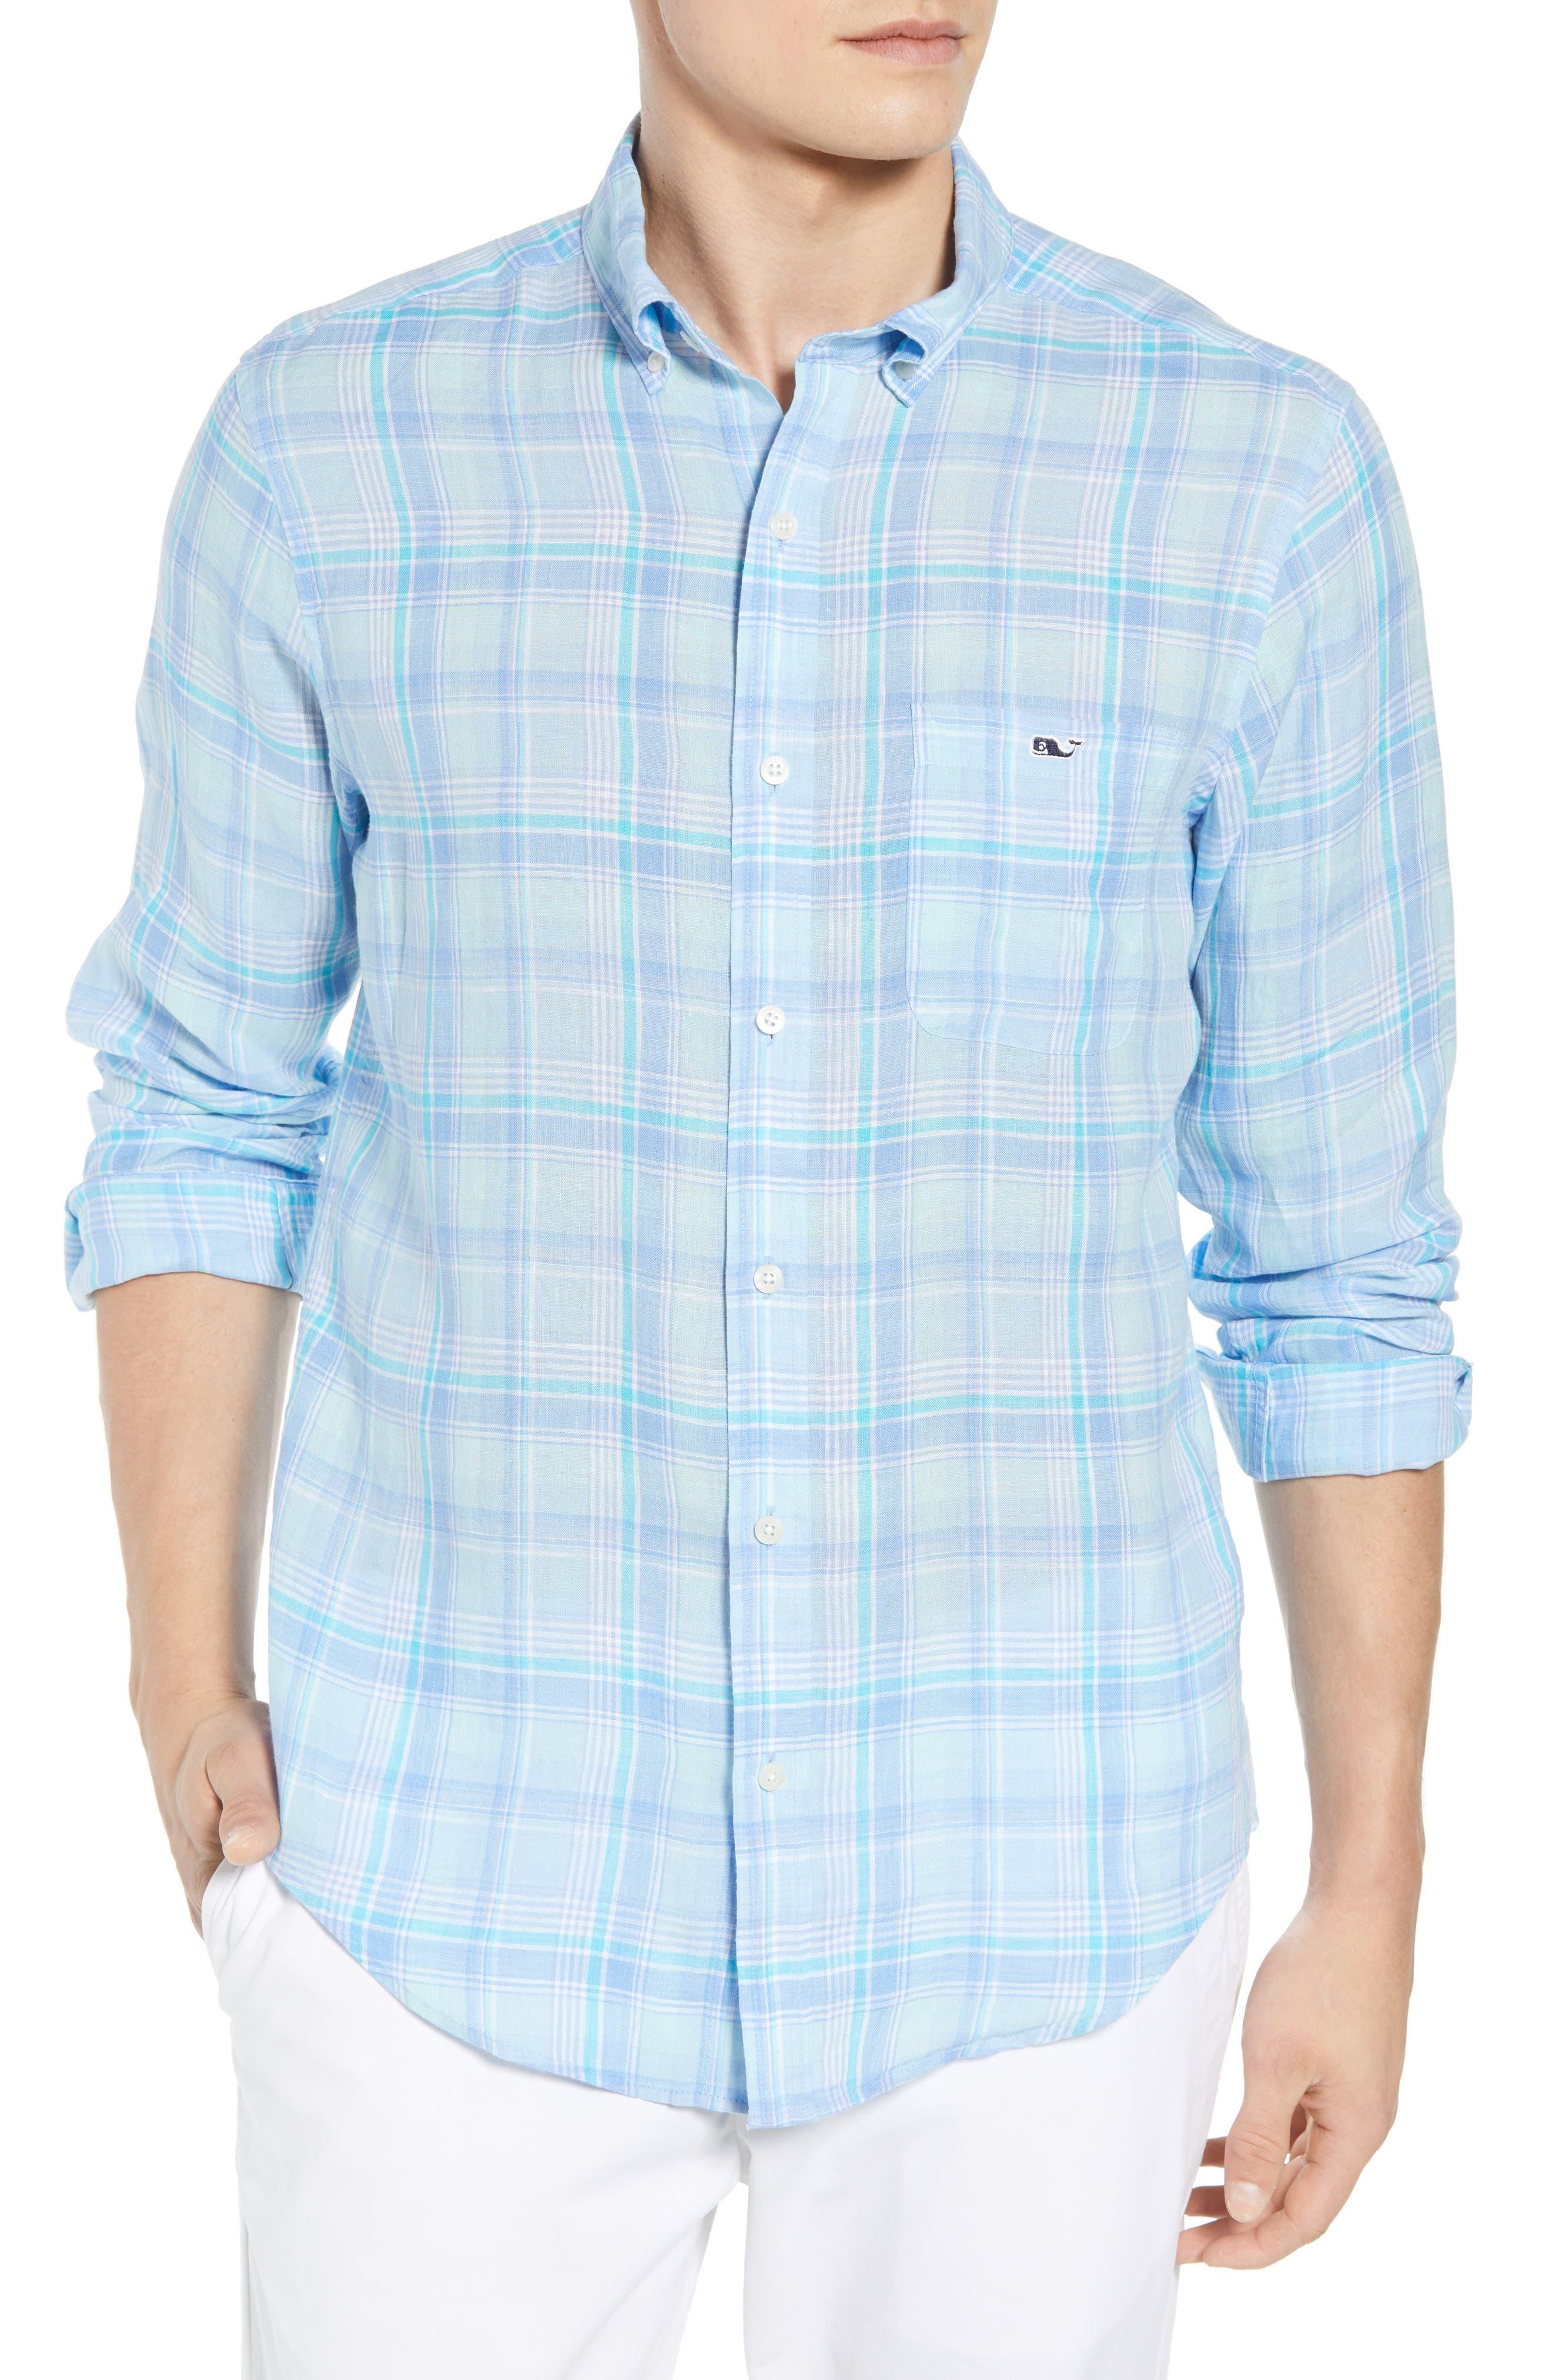 Moore's Island Classic Fit Plaid Sport Shirt,                         Main,                         color, Baja Blue